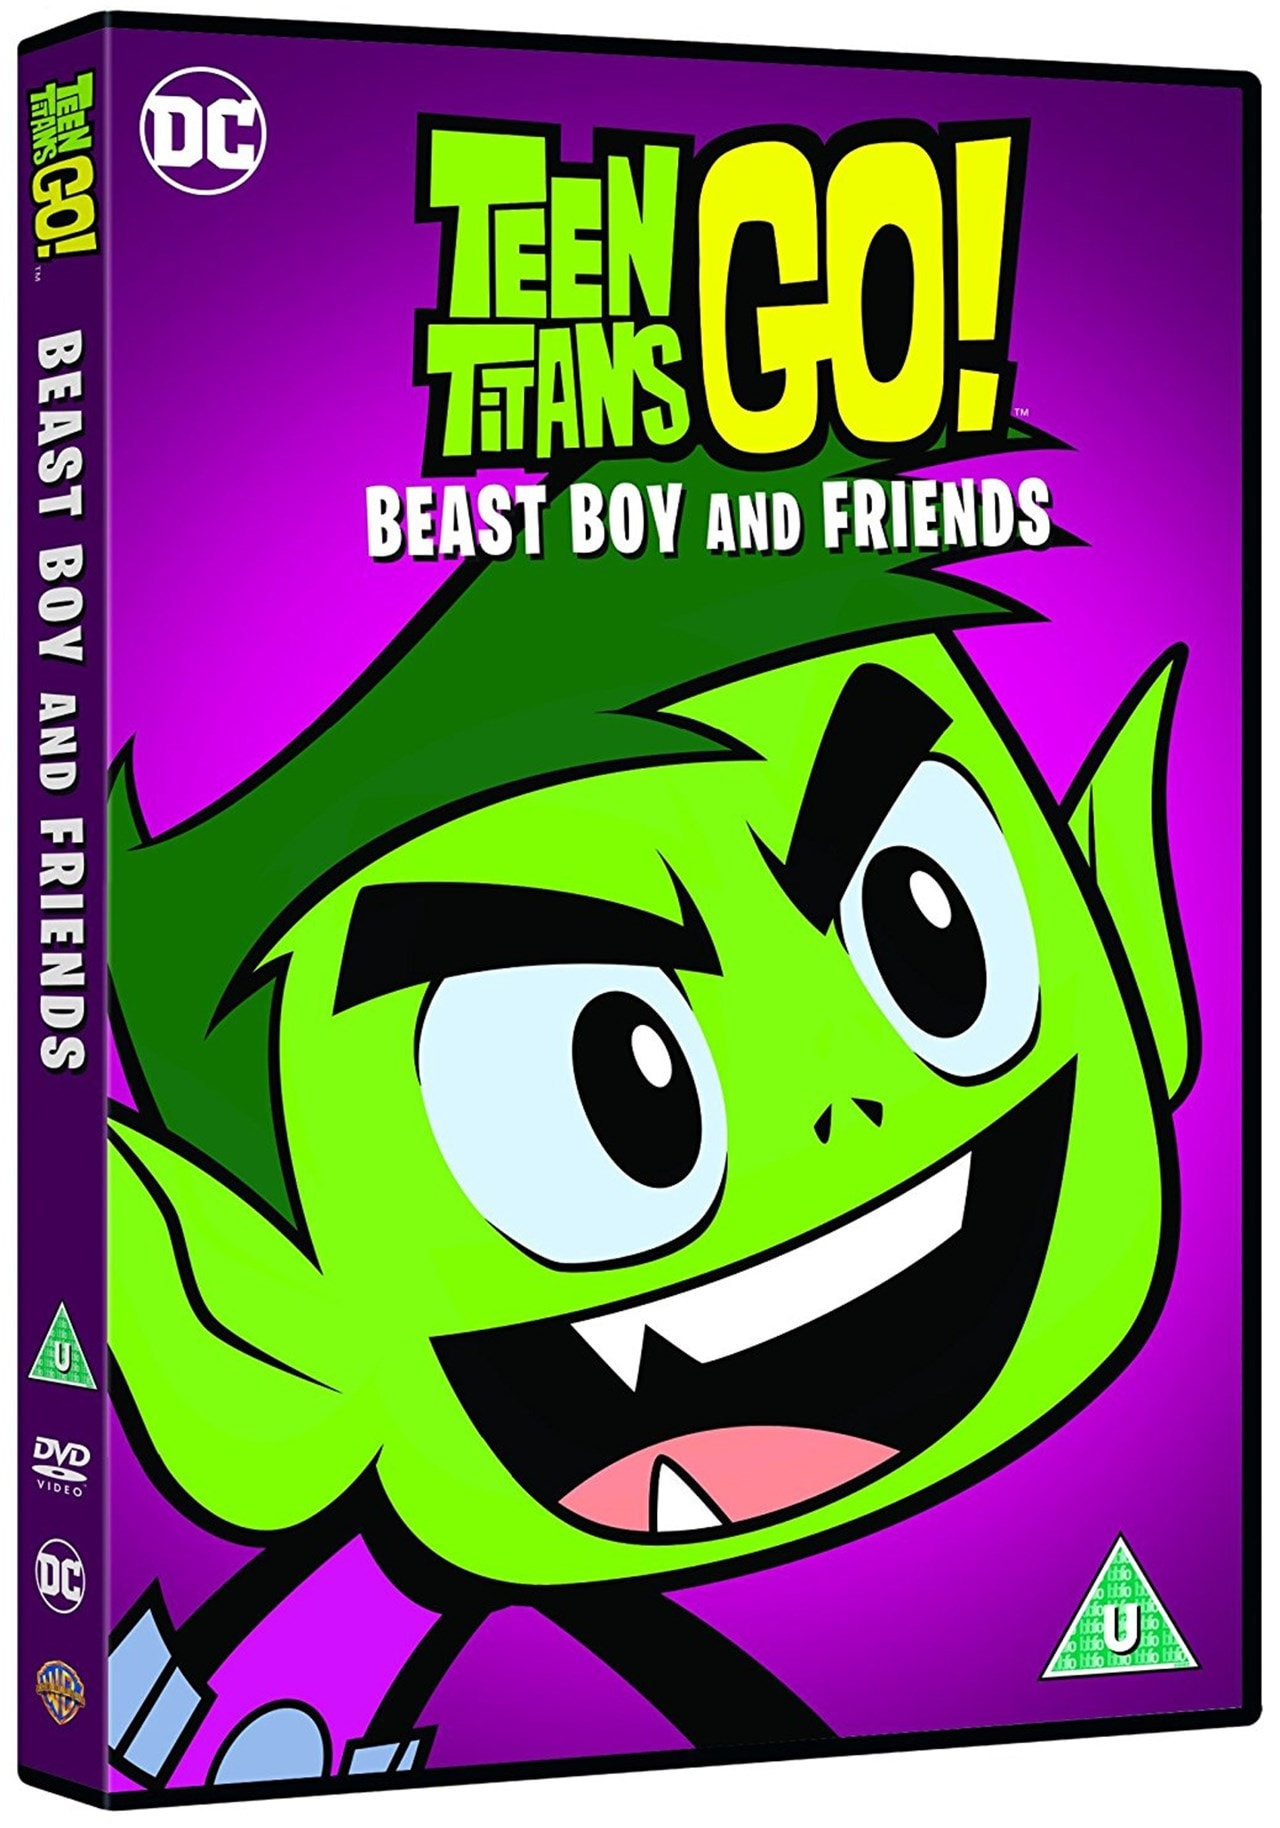 Teen Titans Go!: Beast Boy and Friends - 2